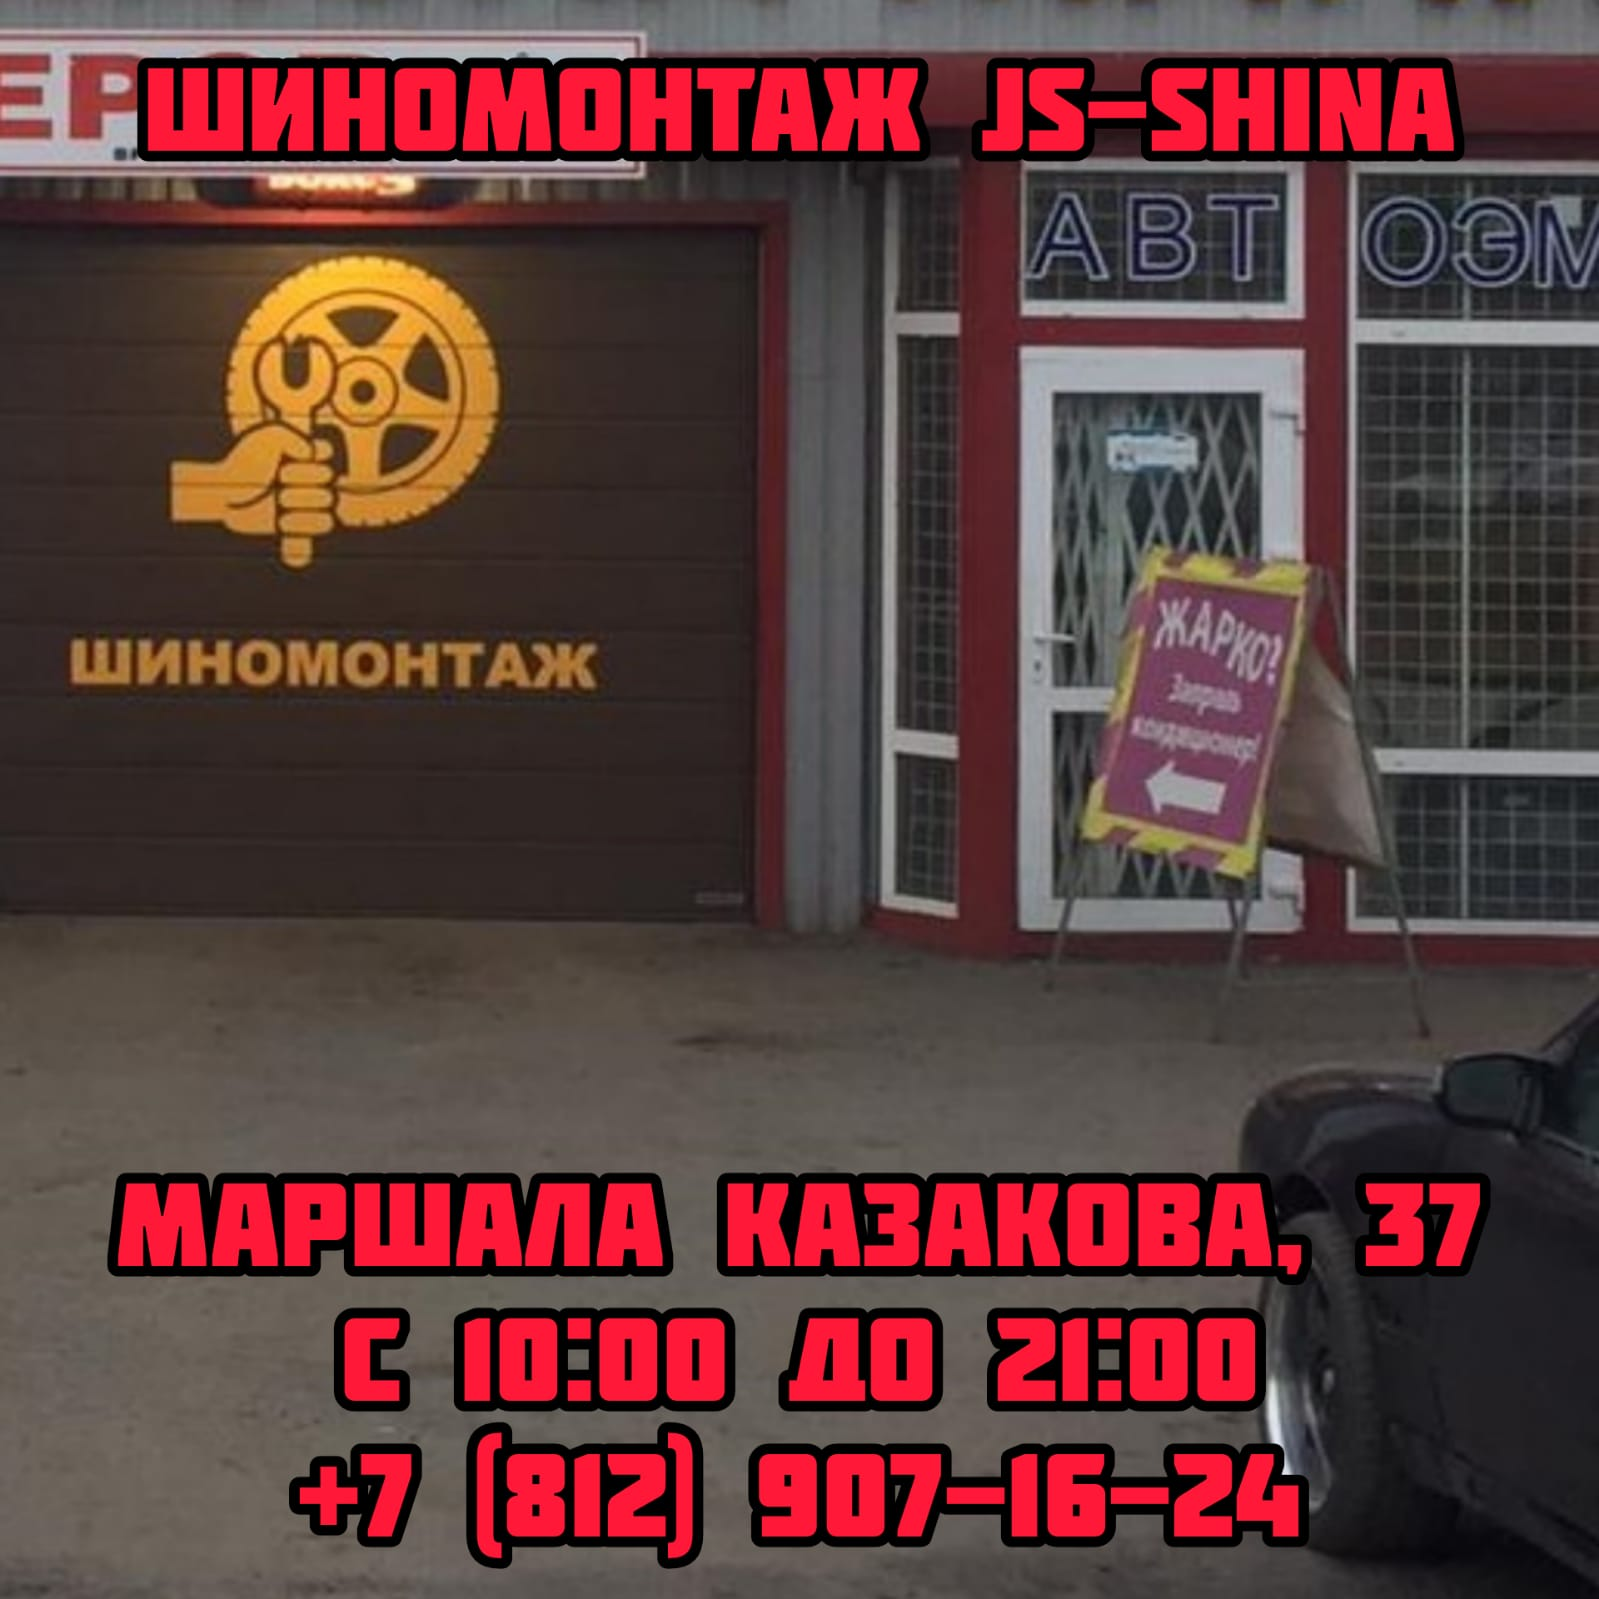 Шиномонтаж в Санкт-Петербурге, ул. Маршала Казакова, 37